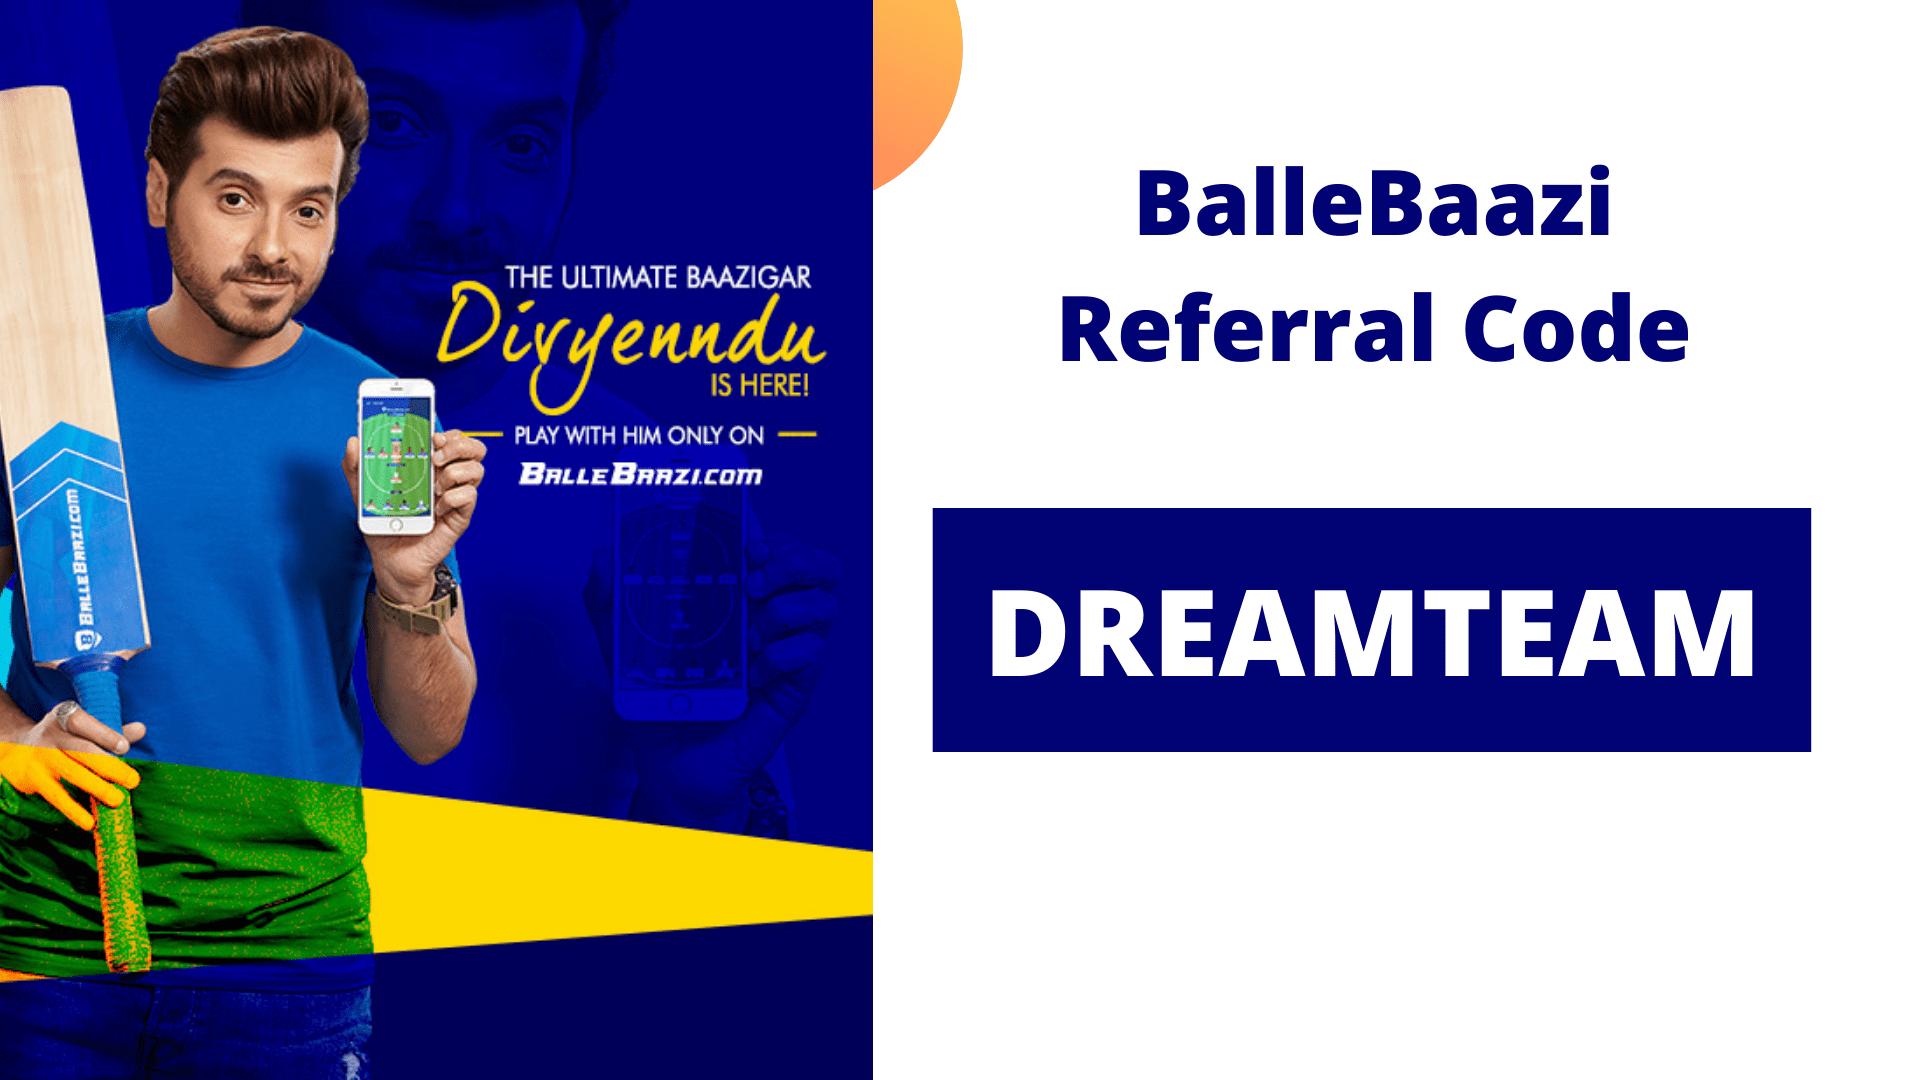 BalleBaazi Referral Code DREAMTEAM